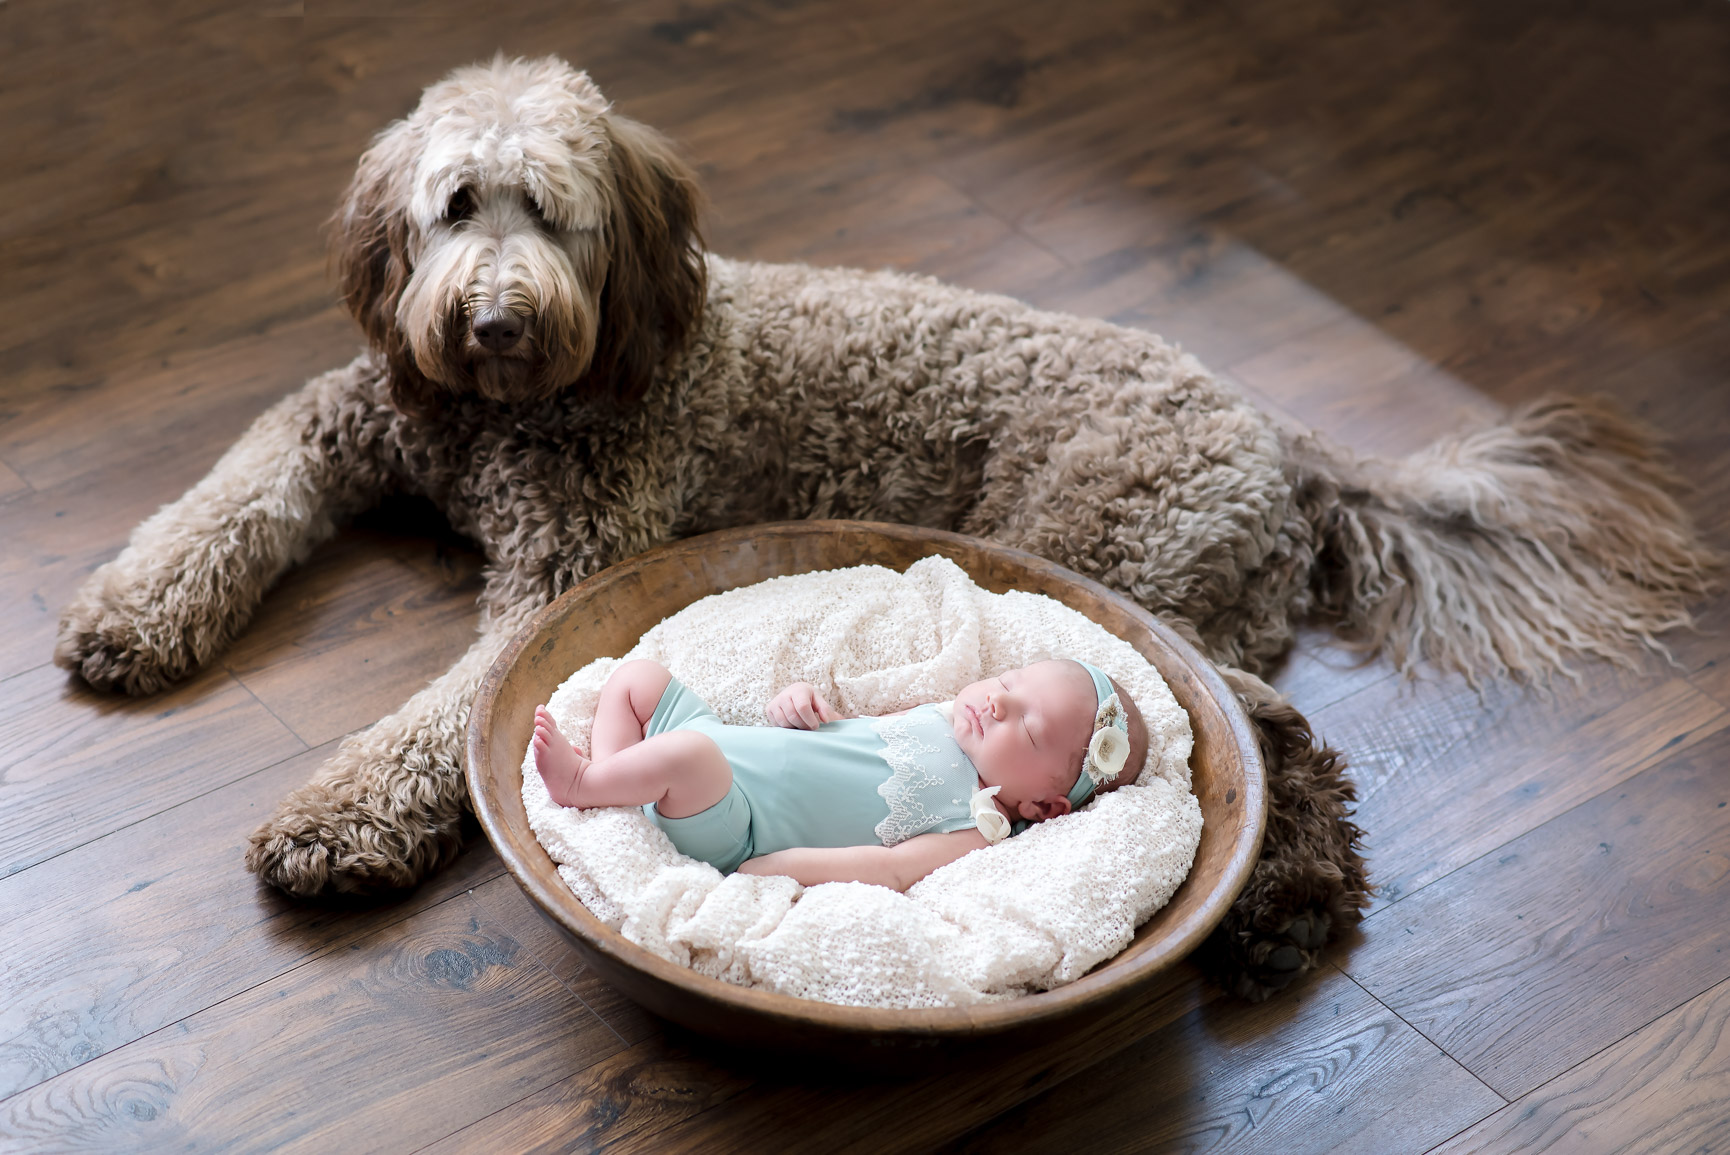 Baby Bowen - Jamie & MelissaBaby BowenDSC_8593-Edit.jpg